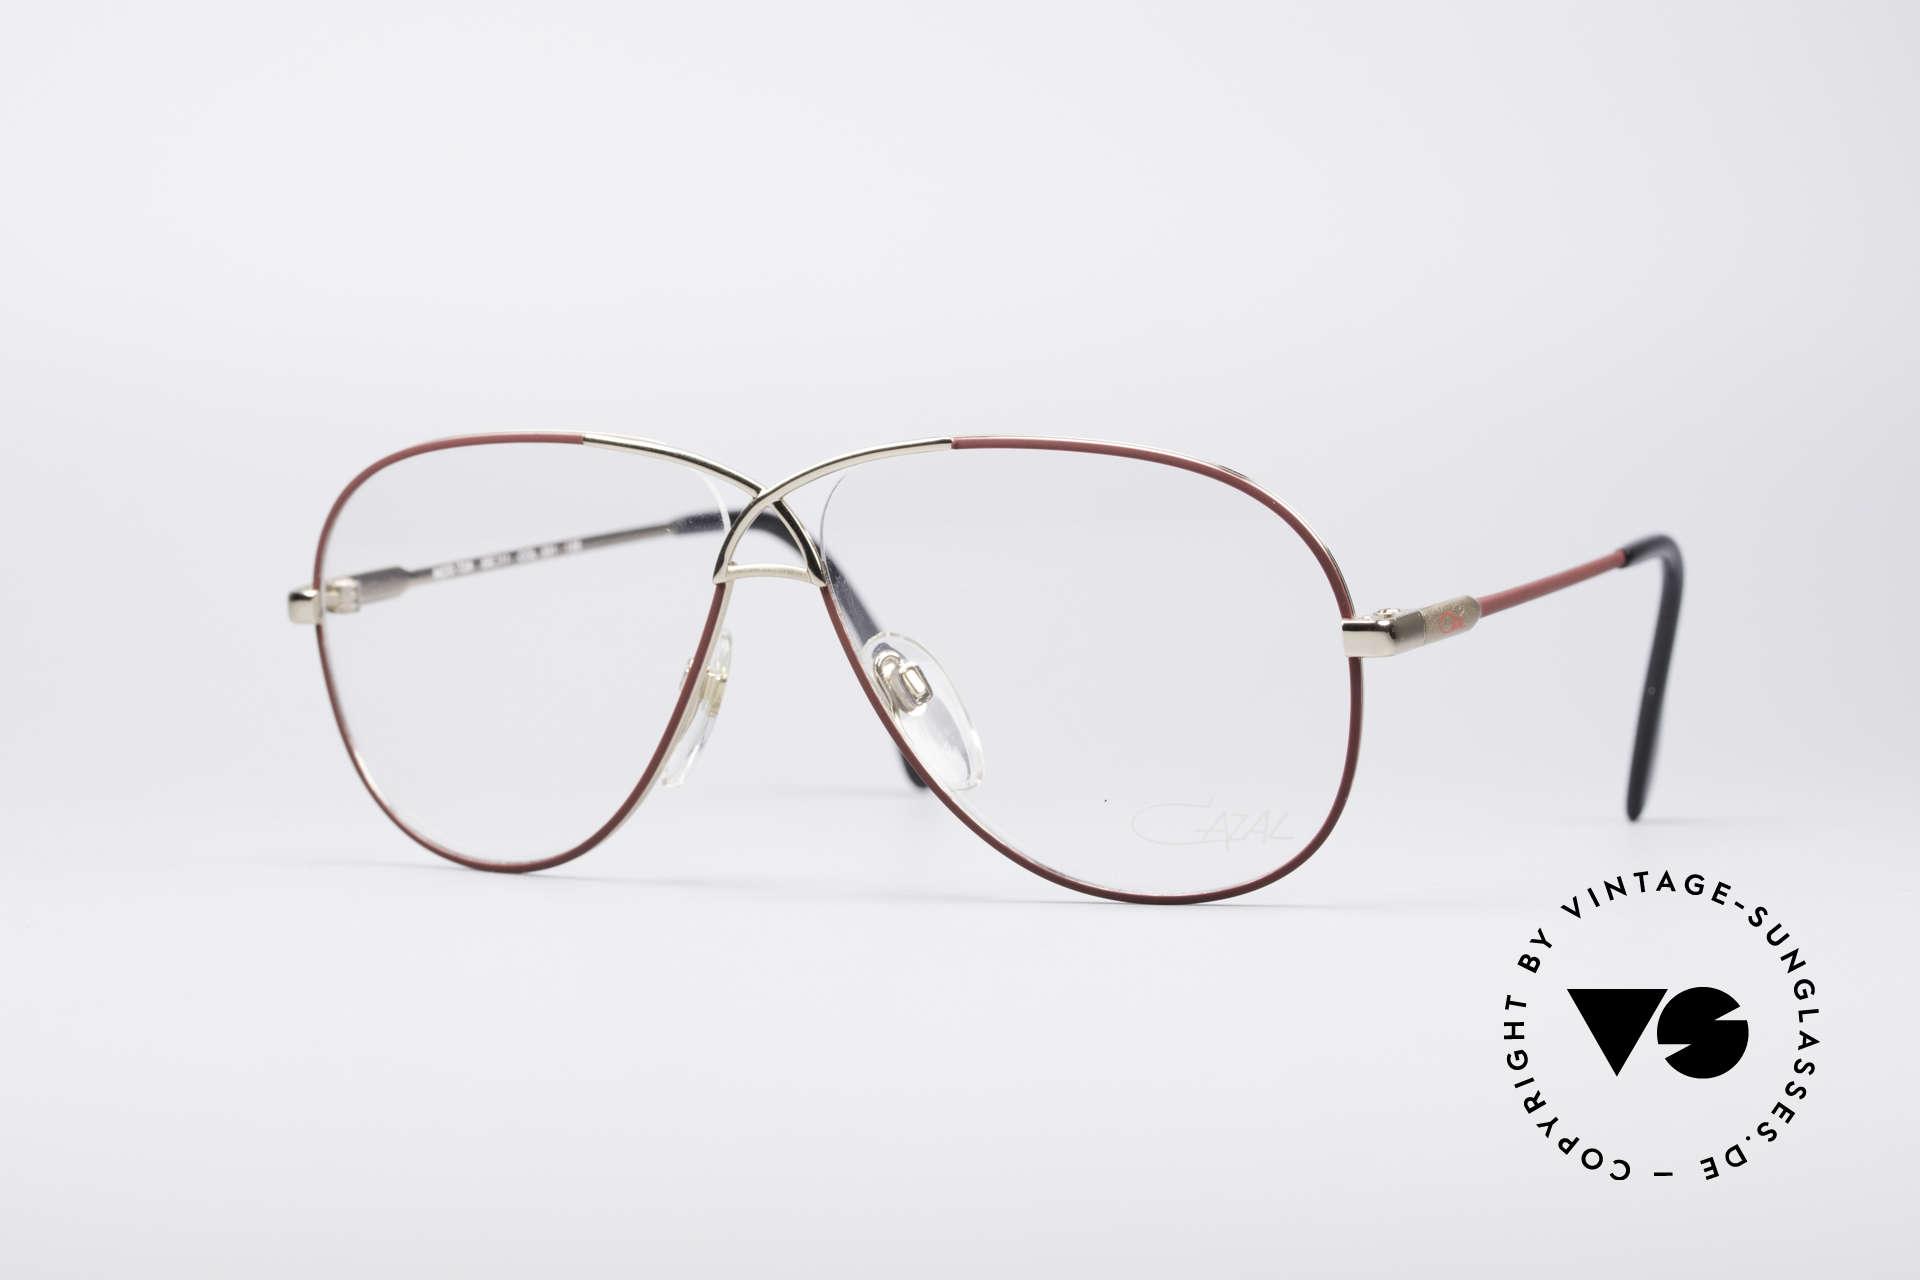 Cazal 728 Aviator Style Vintage Glasses, legendary aviator design from the 80's by Cazal, Made for Men and Women